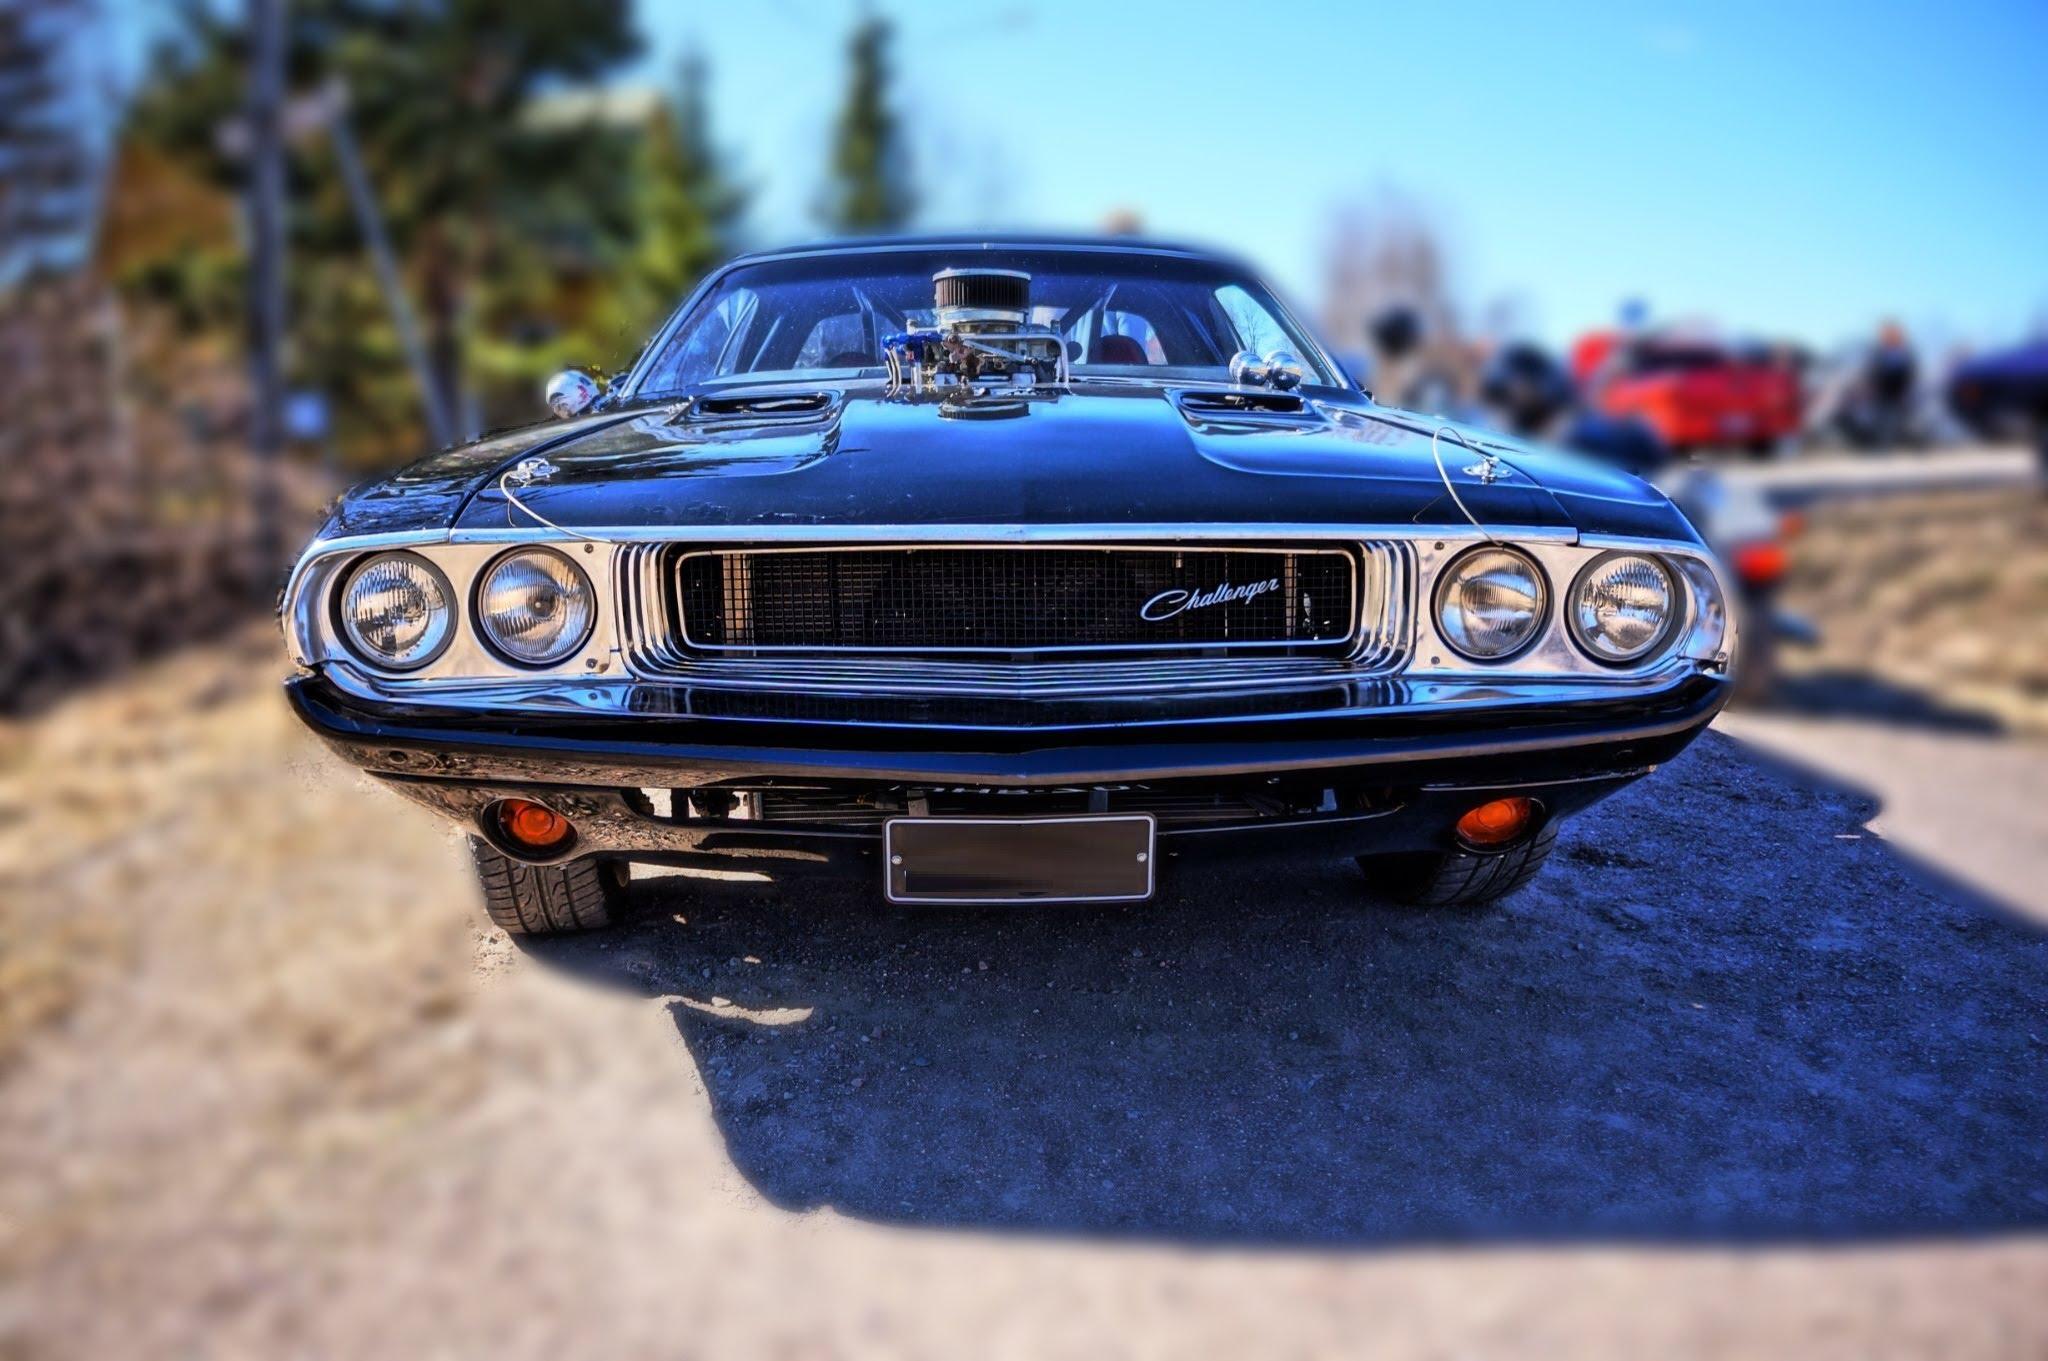 Custom 1970 Dodge Challenger V8 Sound Mopar Muscle Car Muscle Cars Zone